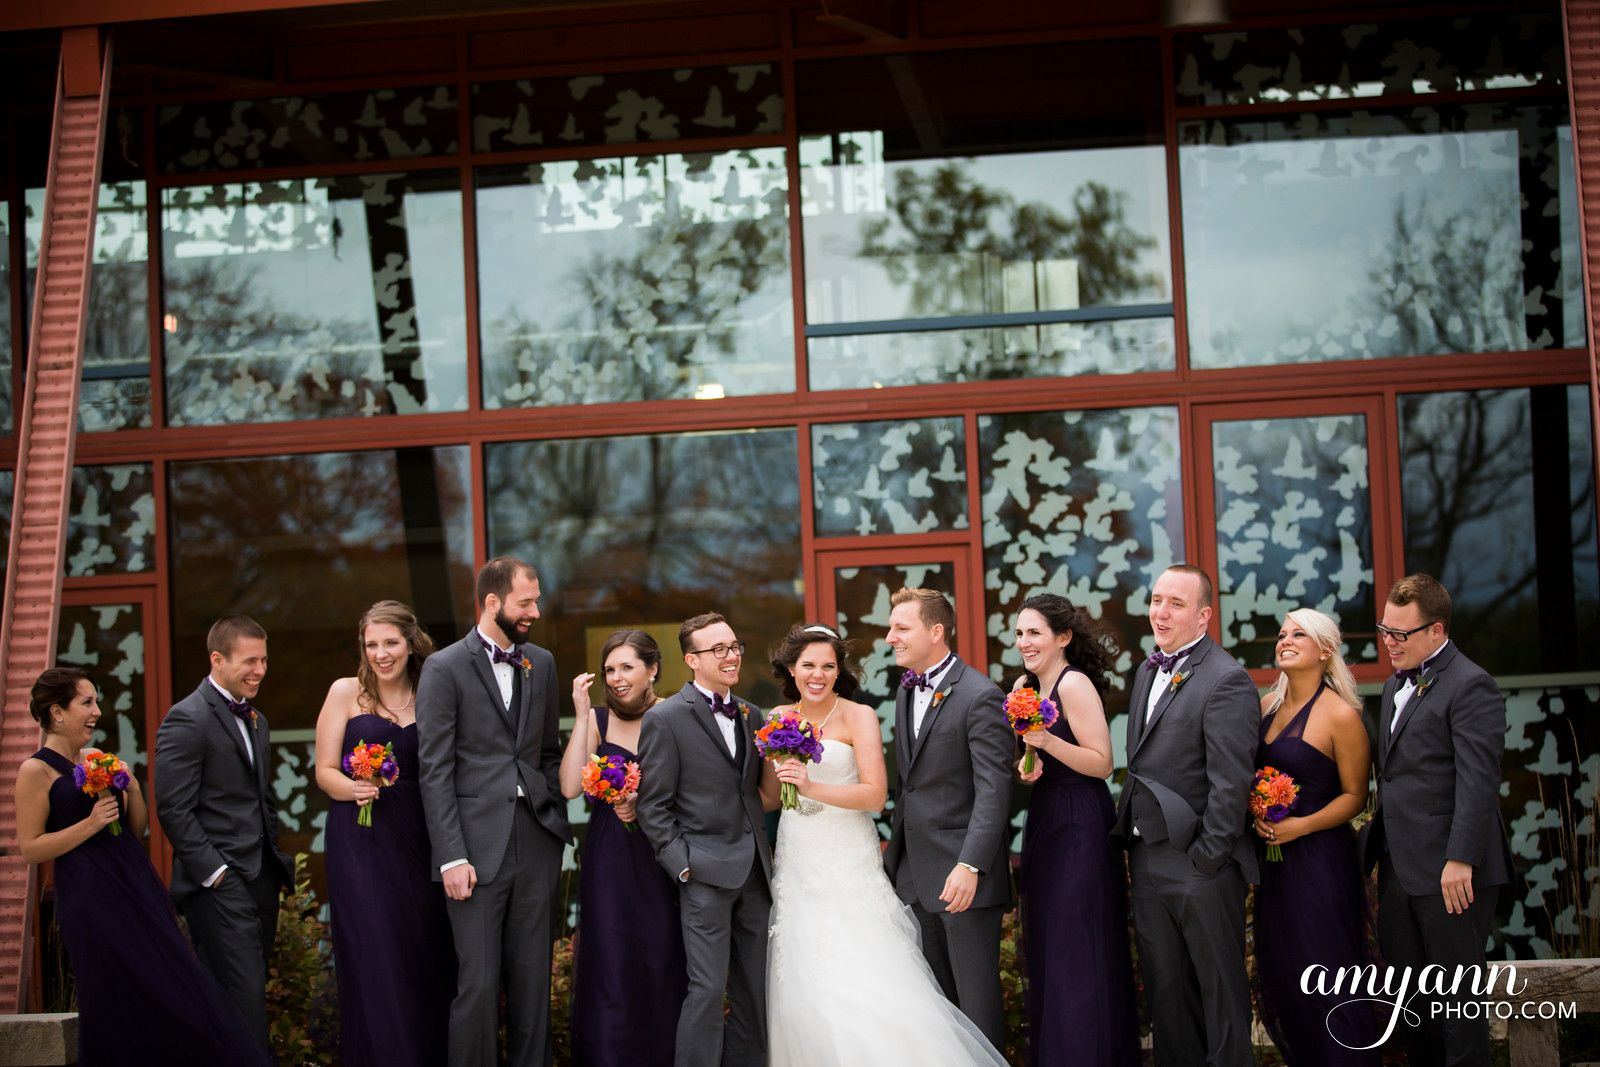 outdoor wedding ceremony sites in akron ohio%0A Melissa   Anthony  Columbus Ohio Fall Wedding at St  Brigid of Kildare  Church